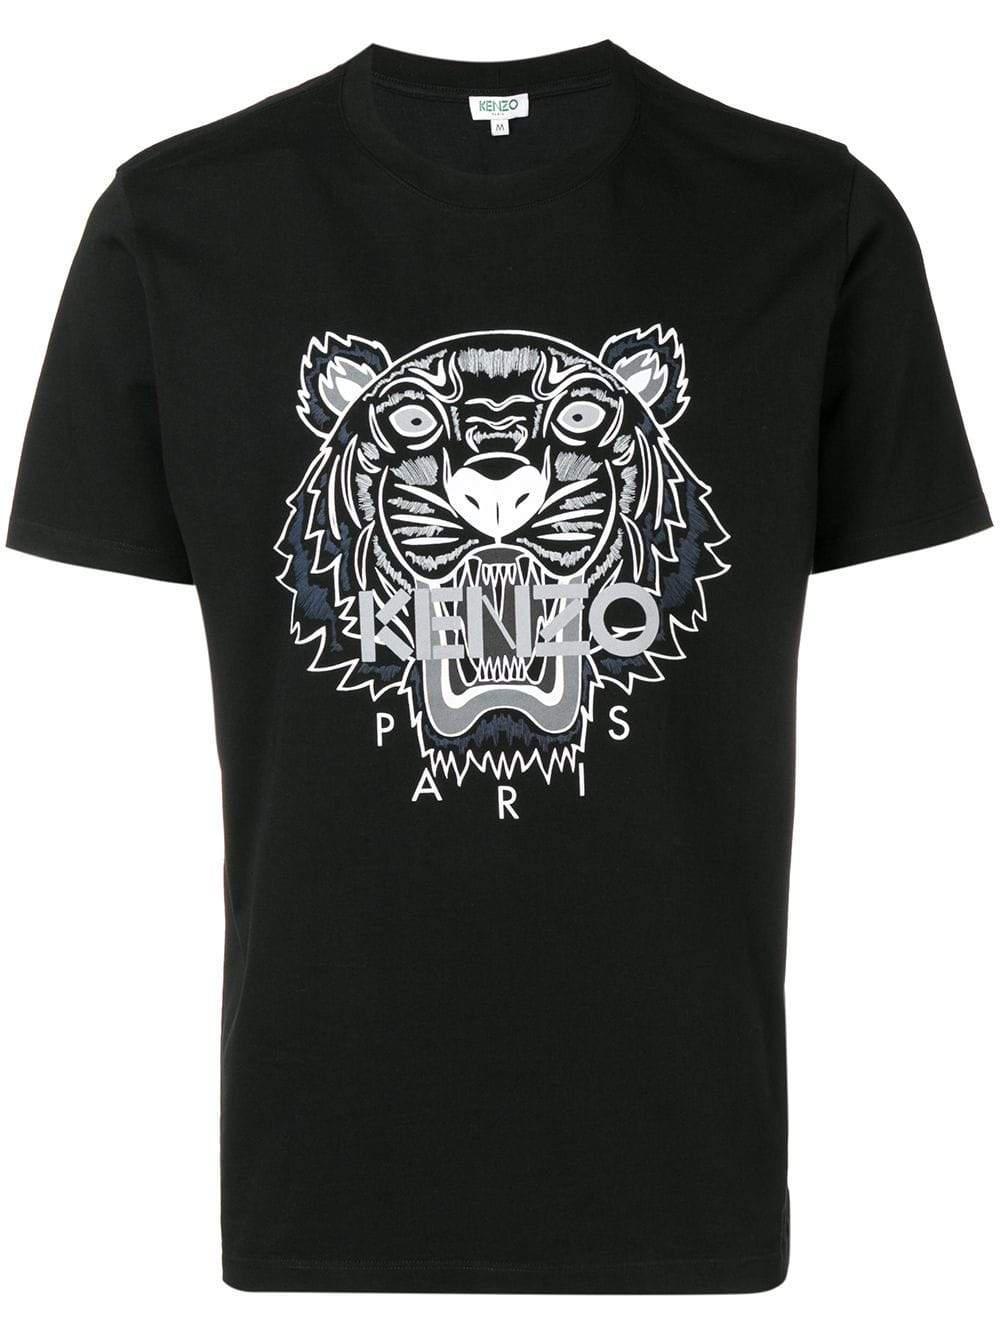 36dc38f2 KENZO - Black Tiger Print T-shirt for Men - Lyst. View fullscreen